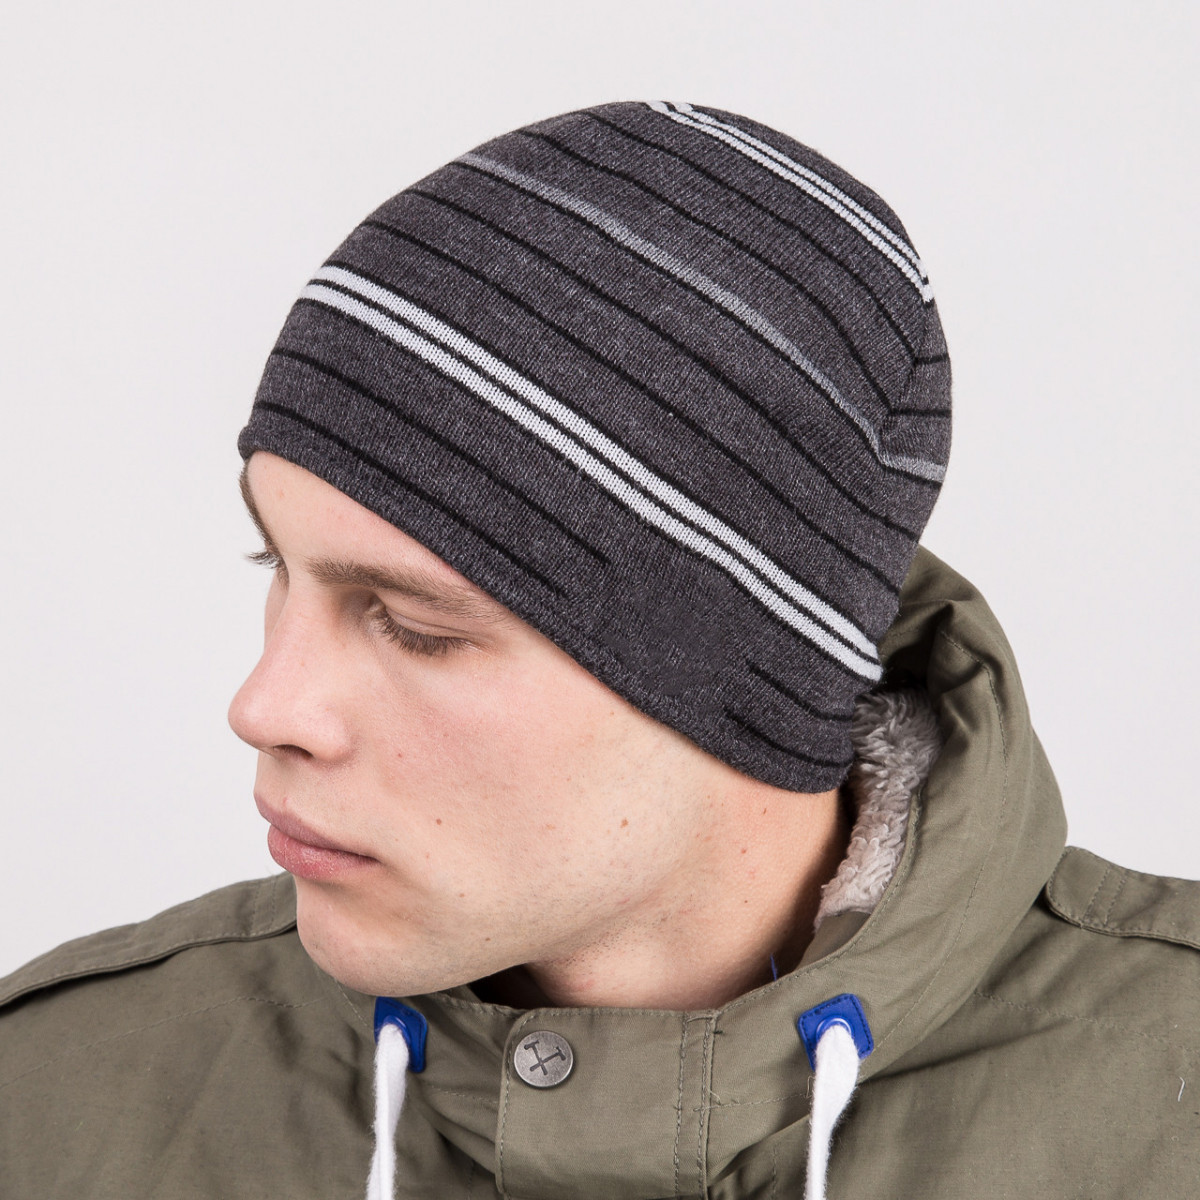 Молодежная мужская зимняя шапка casual в полоску - Артикул m57с